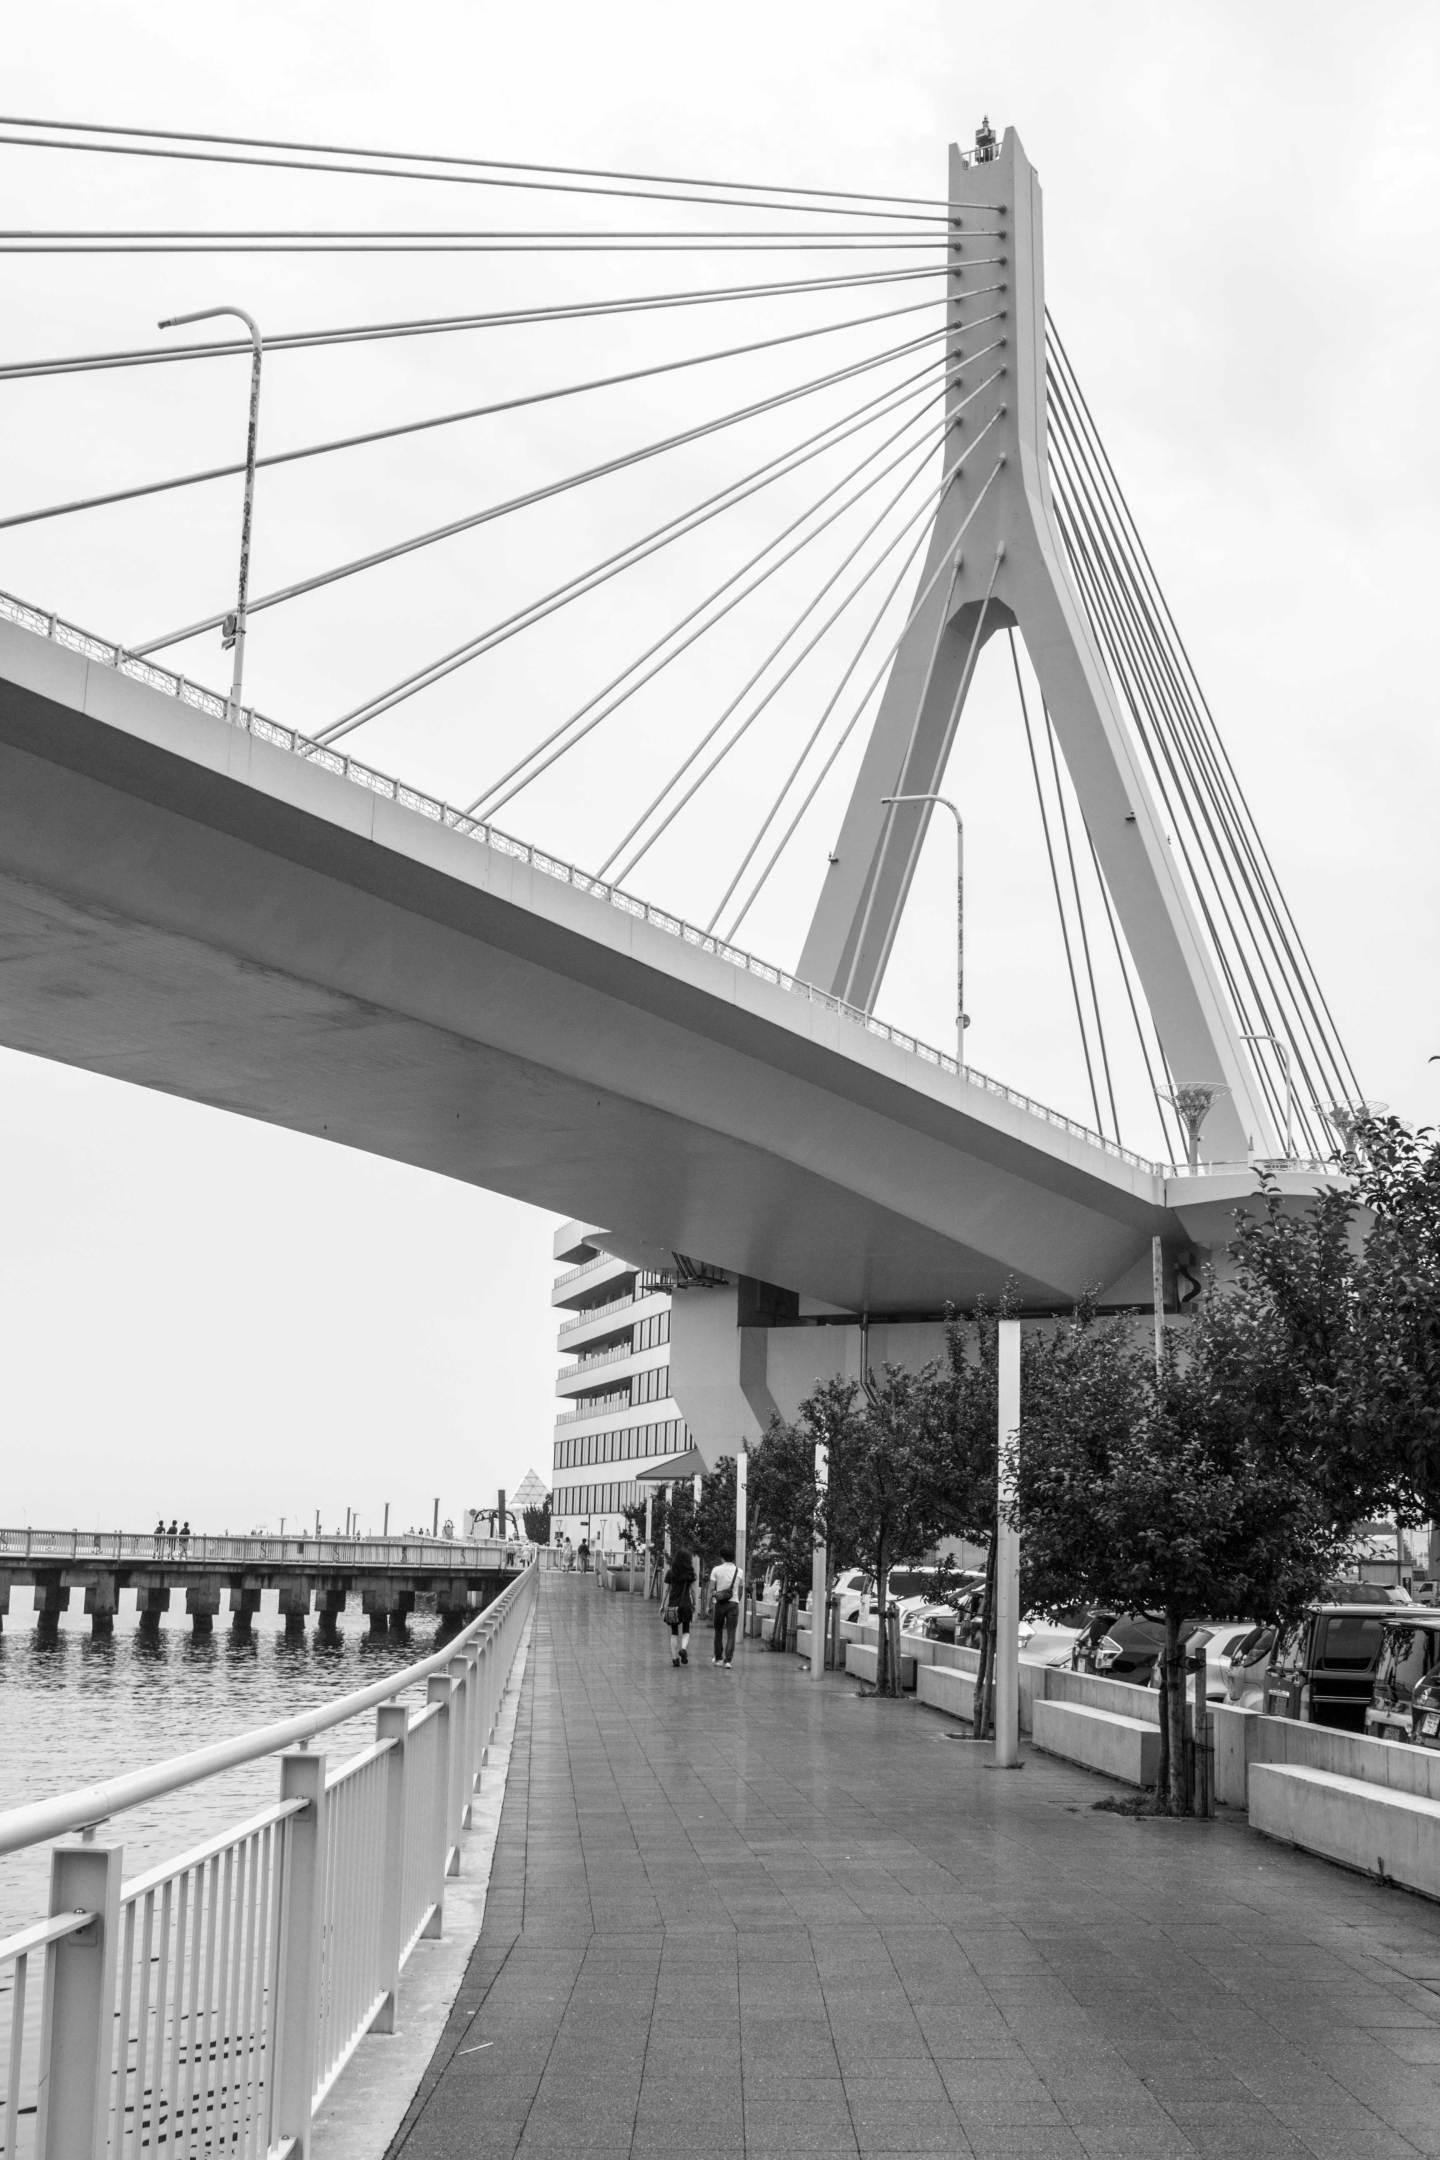 Bridge in Aomori Japan